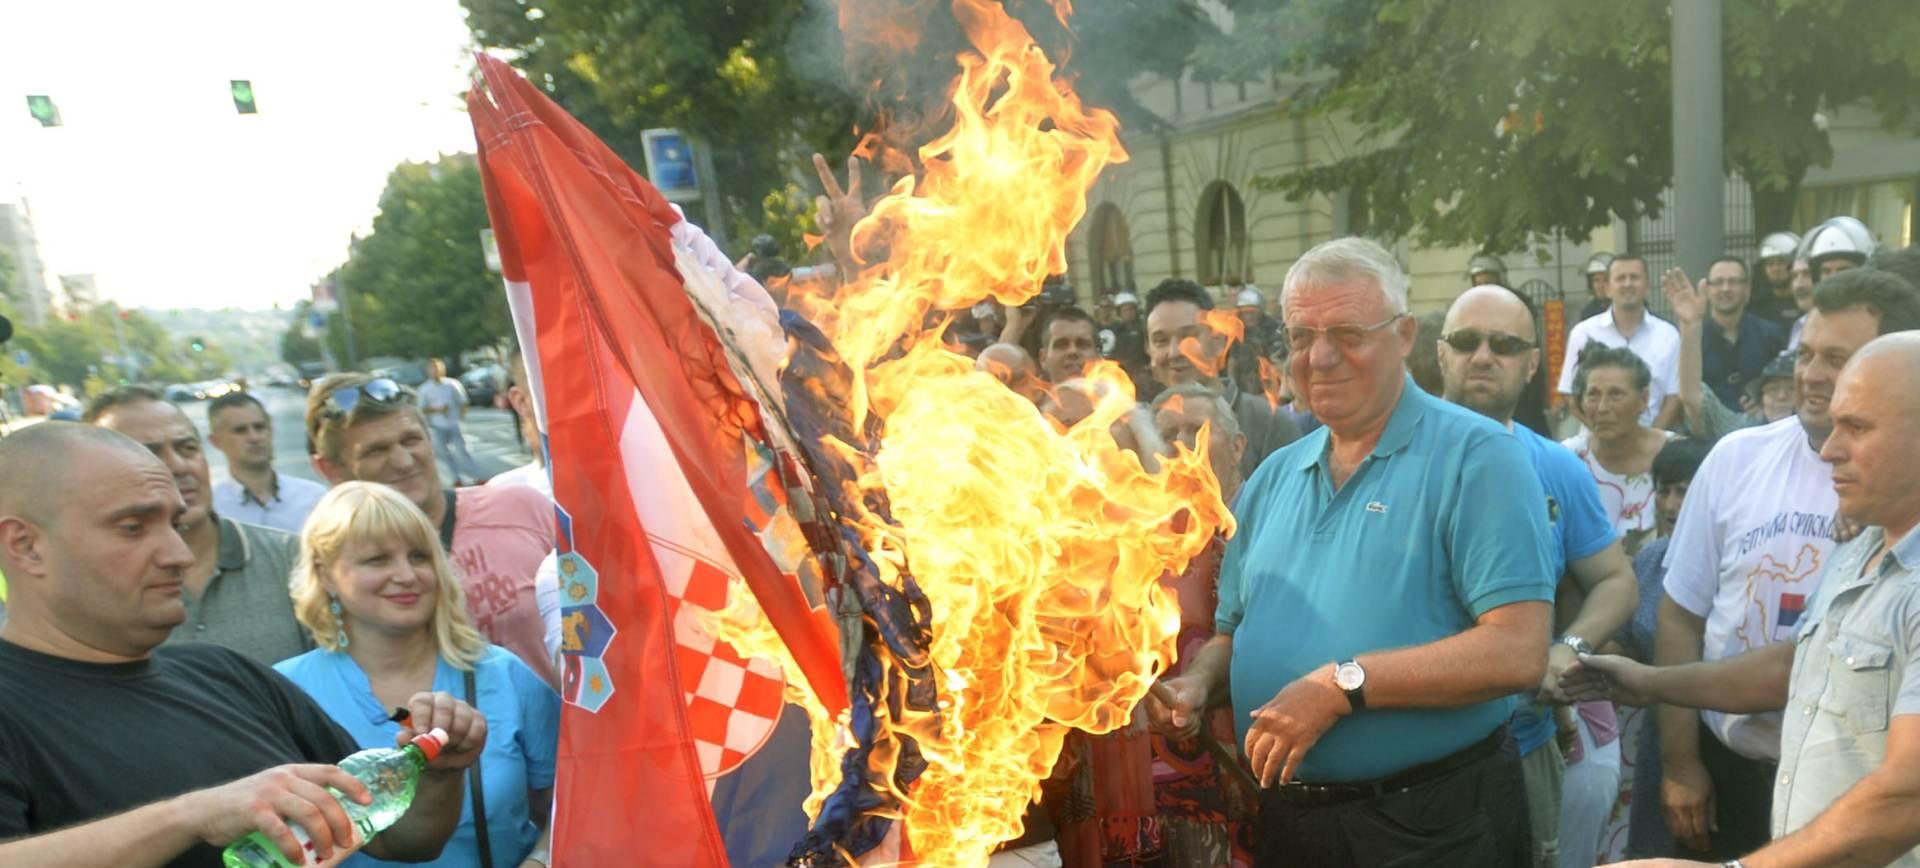 "PLENKOVIĆ: ""Očekujem profesionalan pristup vlasti Srbije"""